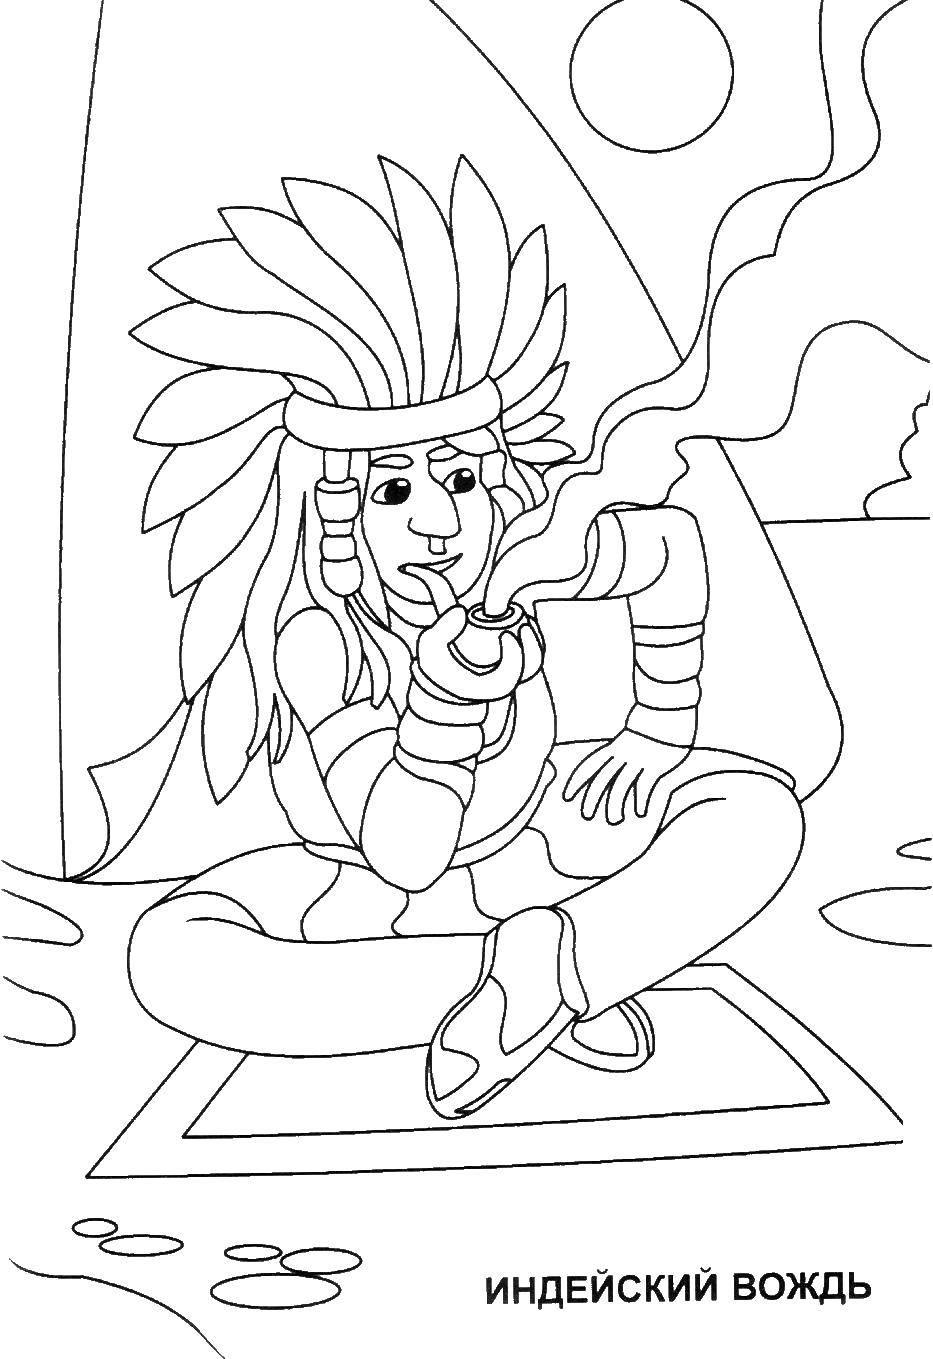 Раскраска Вождь индейцев Скачать вождь, индейцы.  Распечатать ,Рыцари,